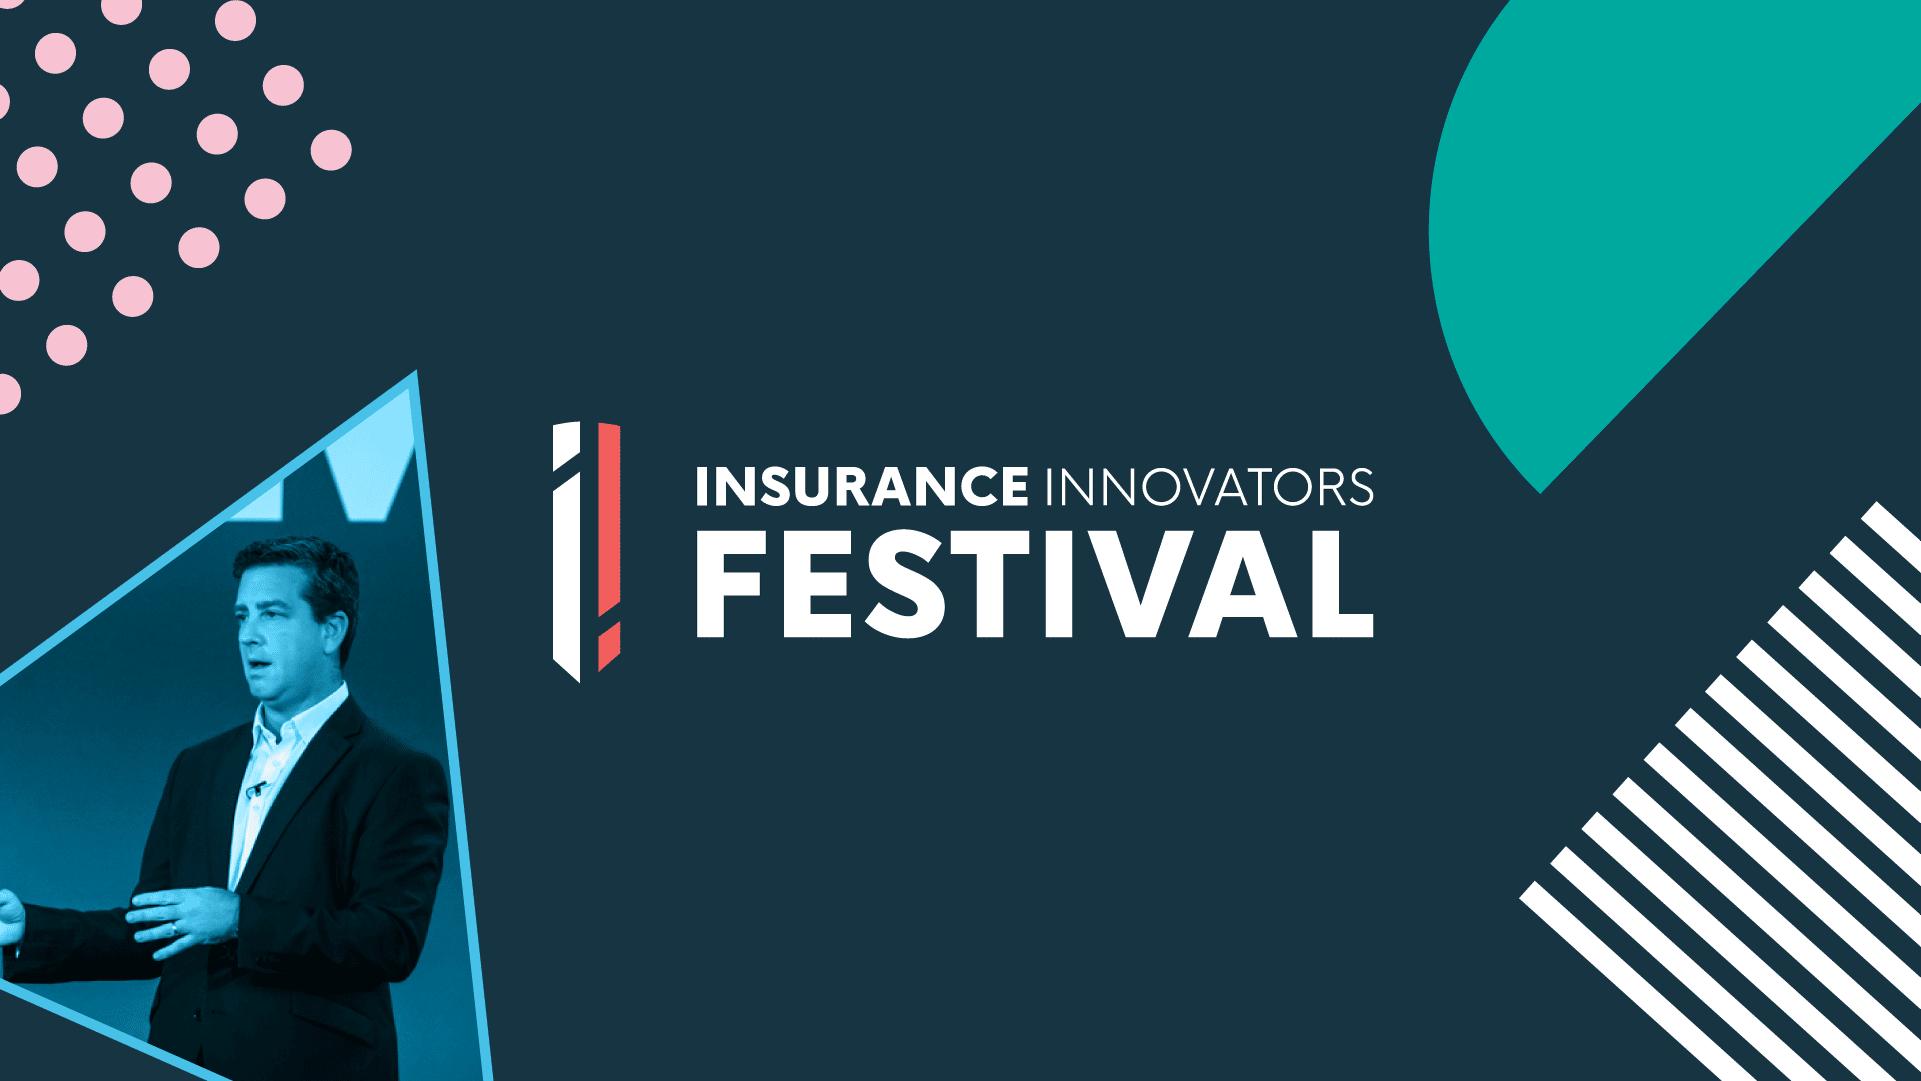 Insurance Innovators Autumn Festival